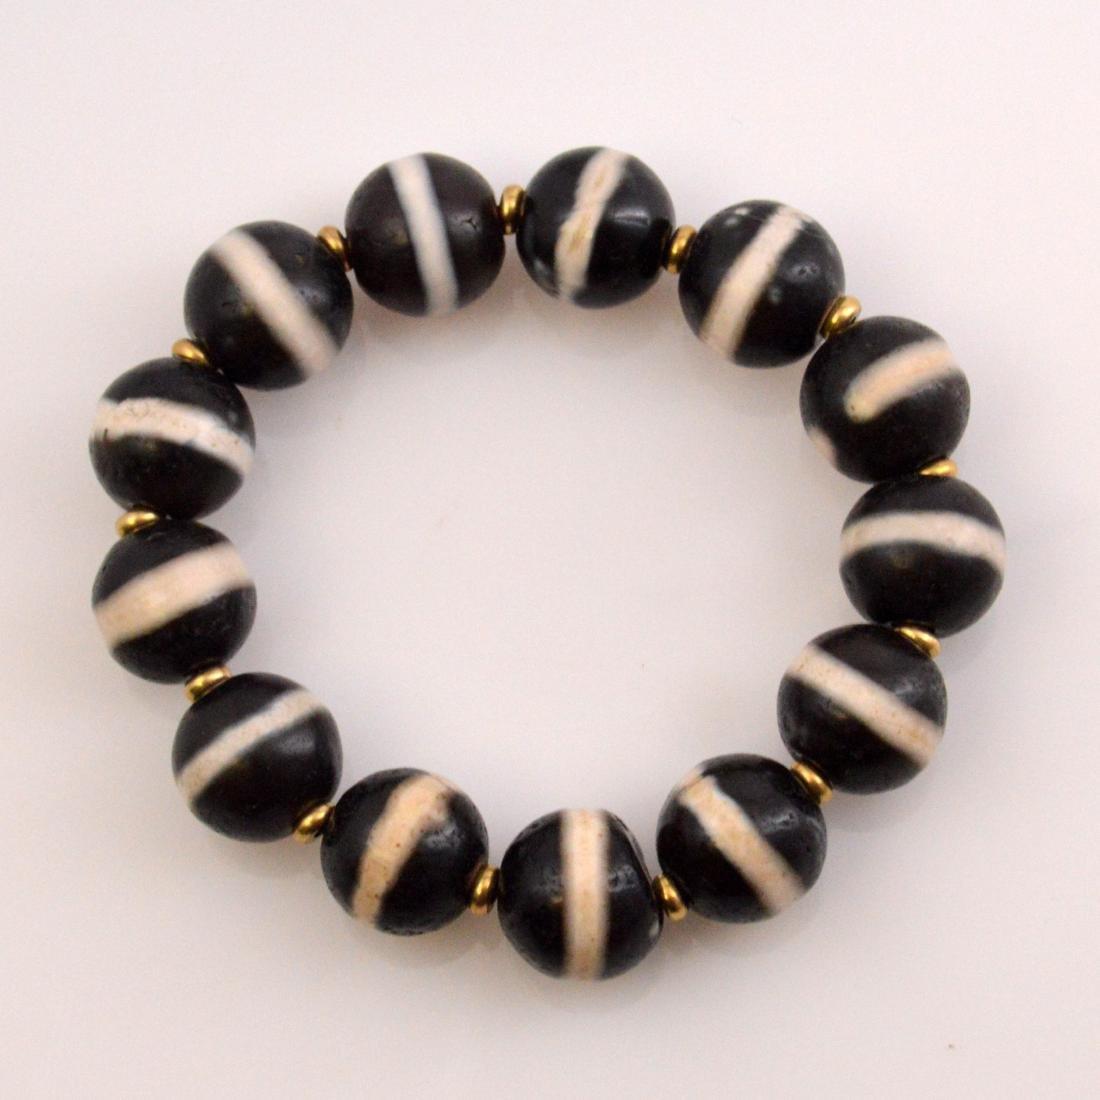 Old Medicine Bead Bracelet